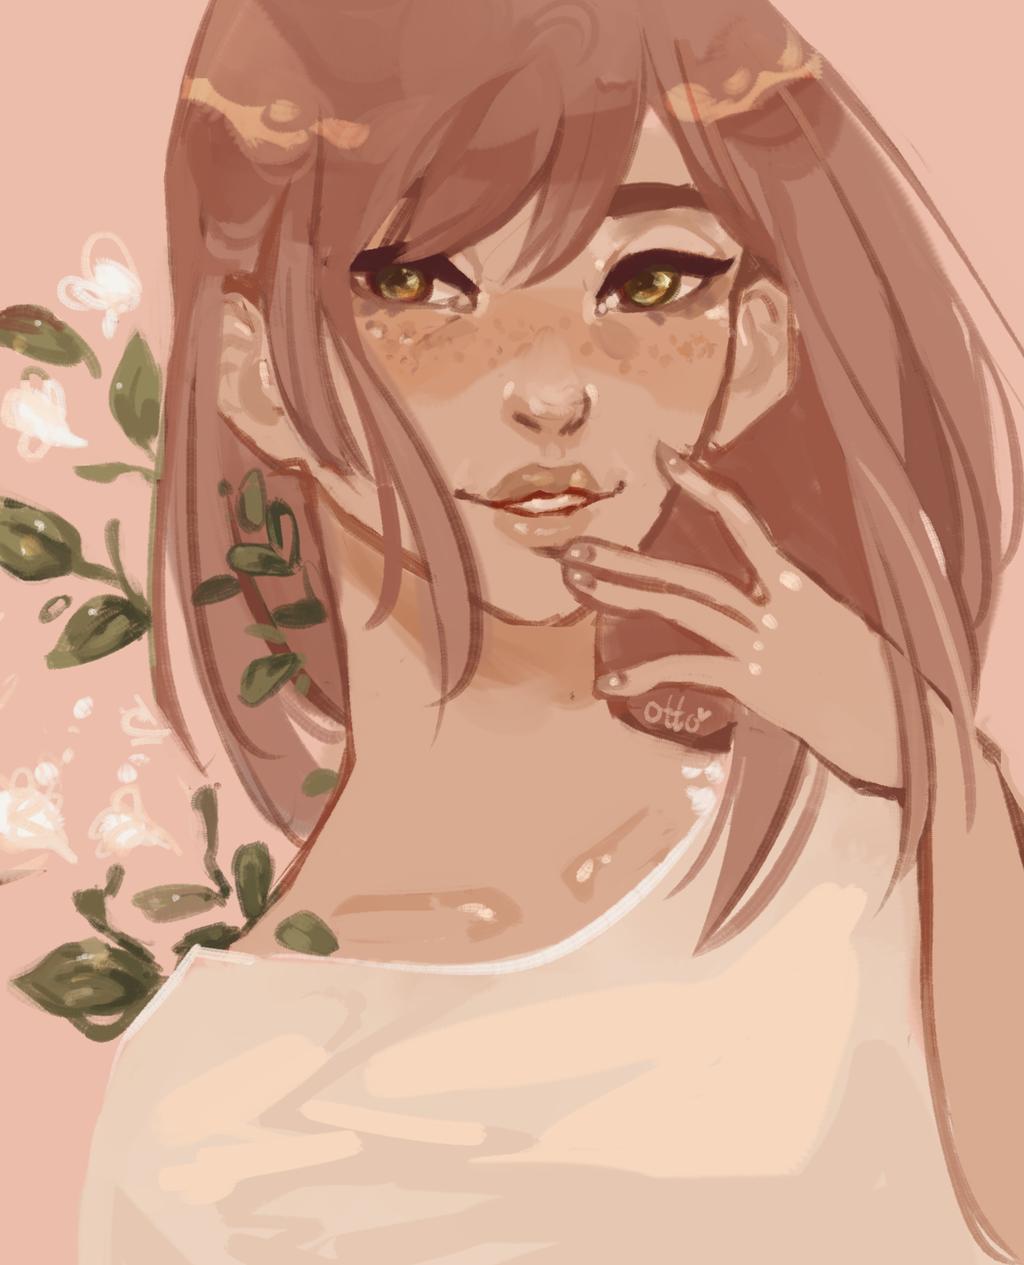 PRETTY GIRL by R0BUTT